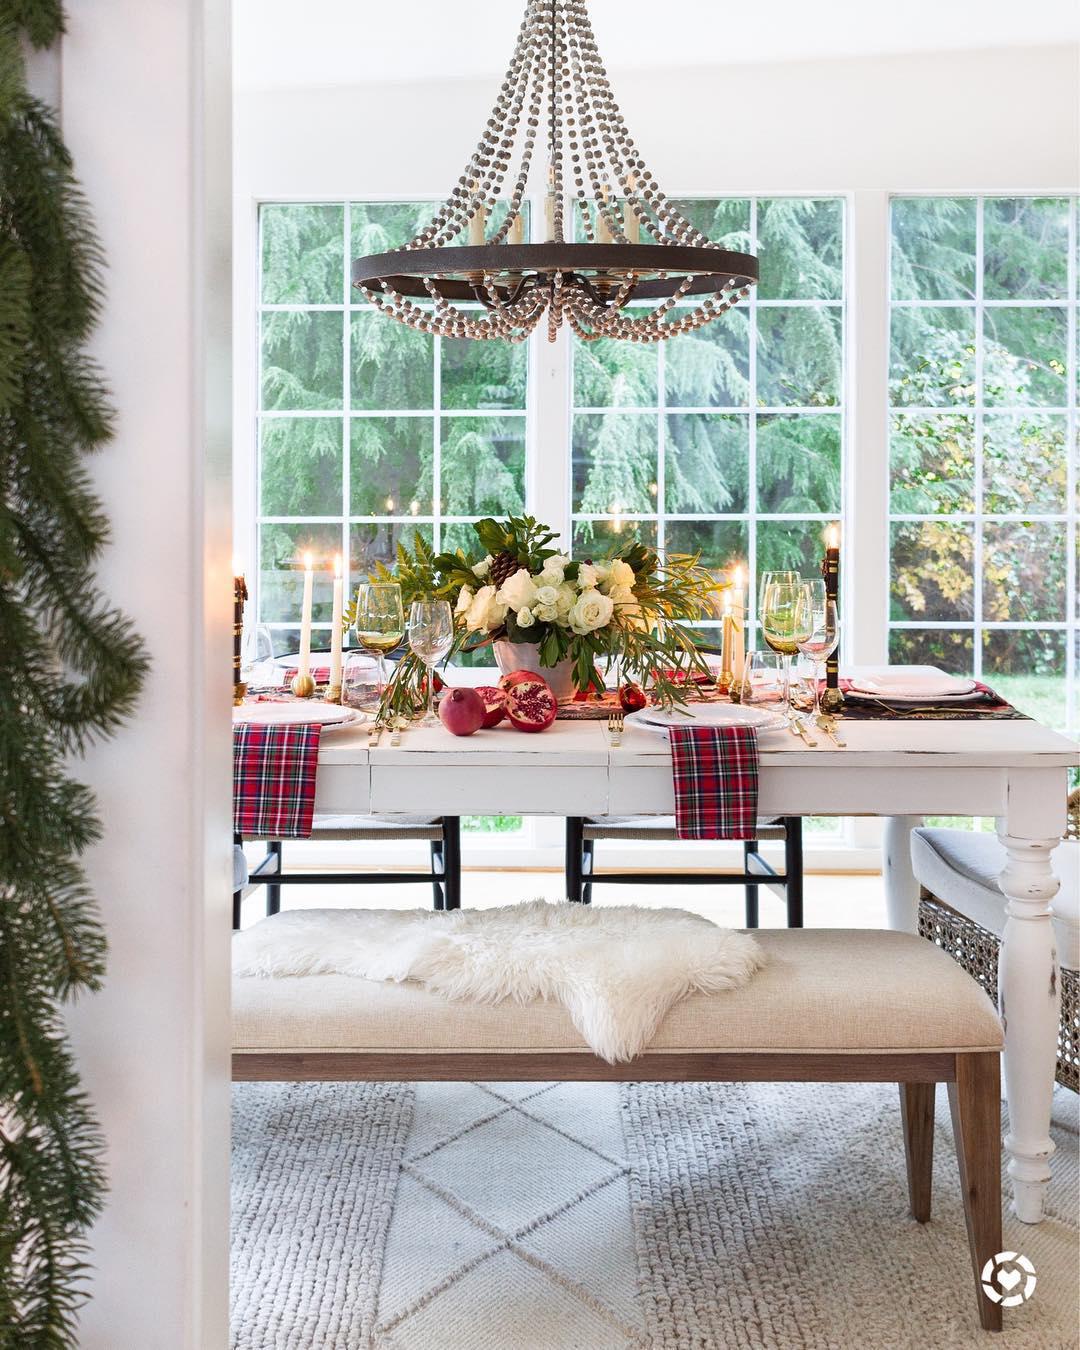 Christmas Tablescape Ideas | ZevyJoy Blog